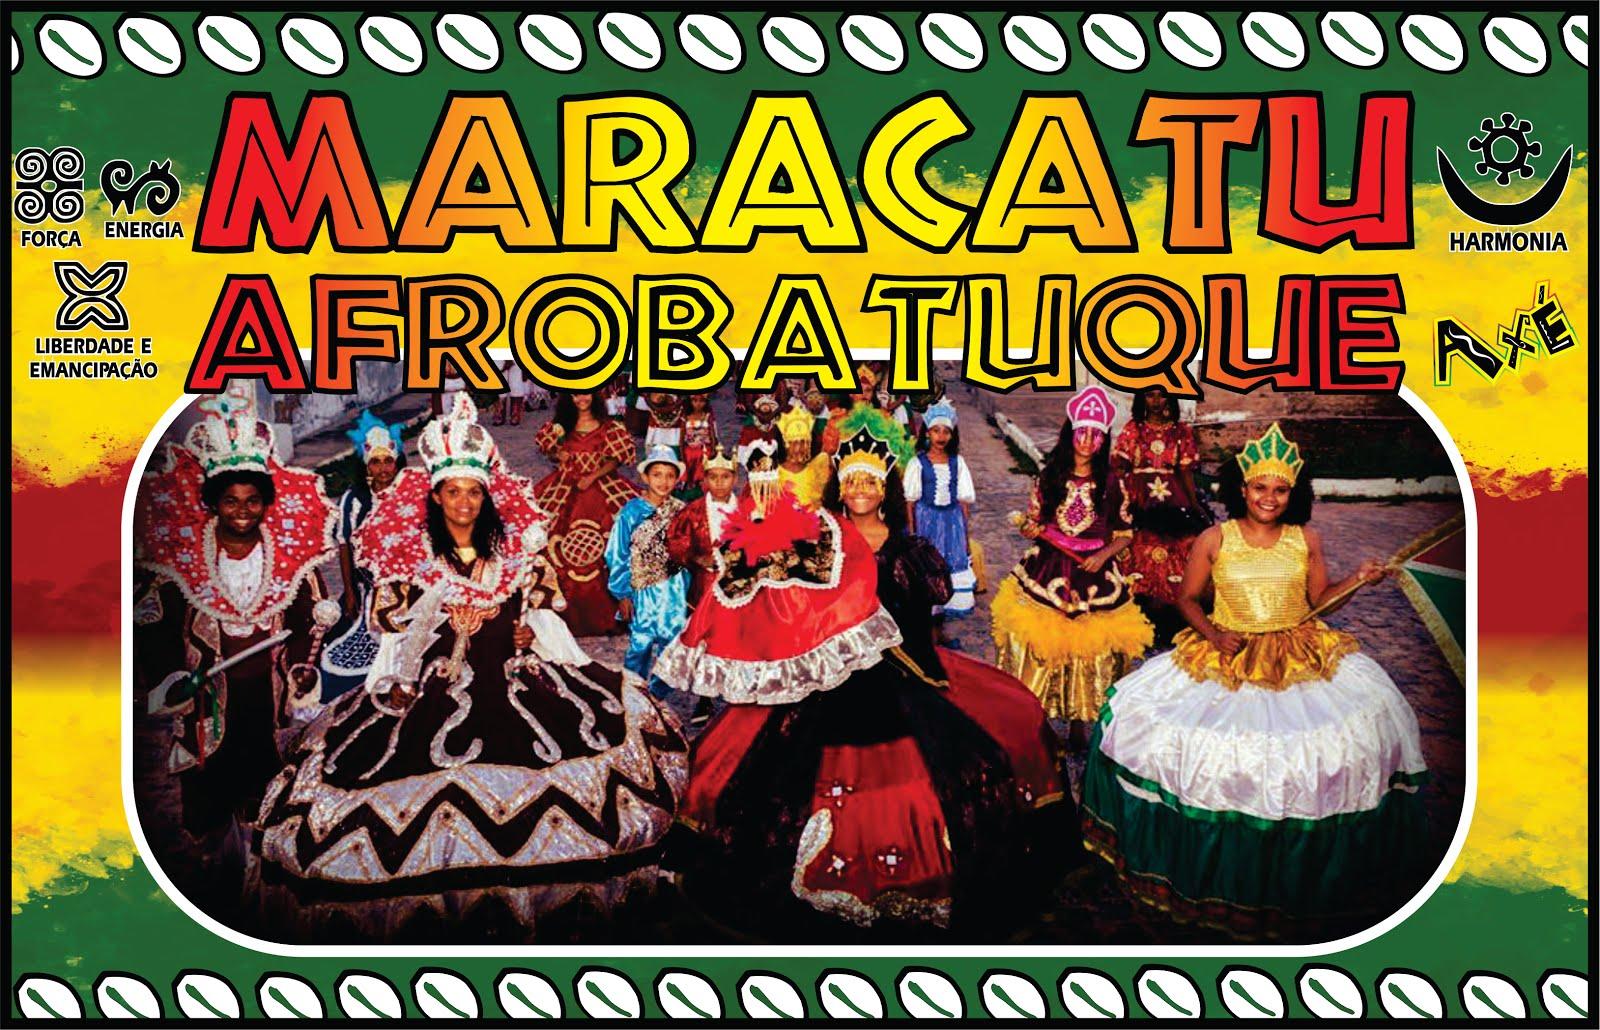 GRUPO CULTURAL MARACATU AFROBATUQUE